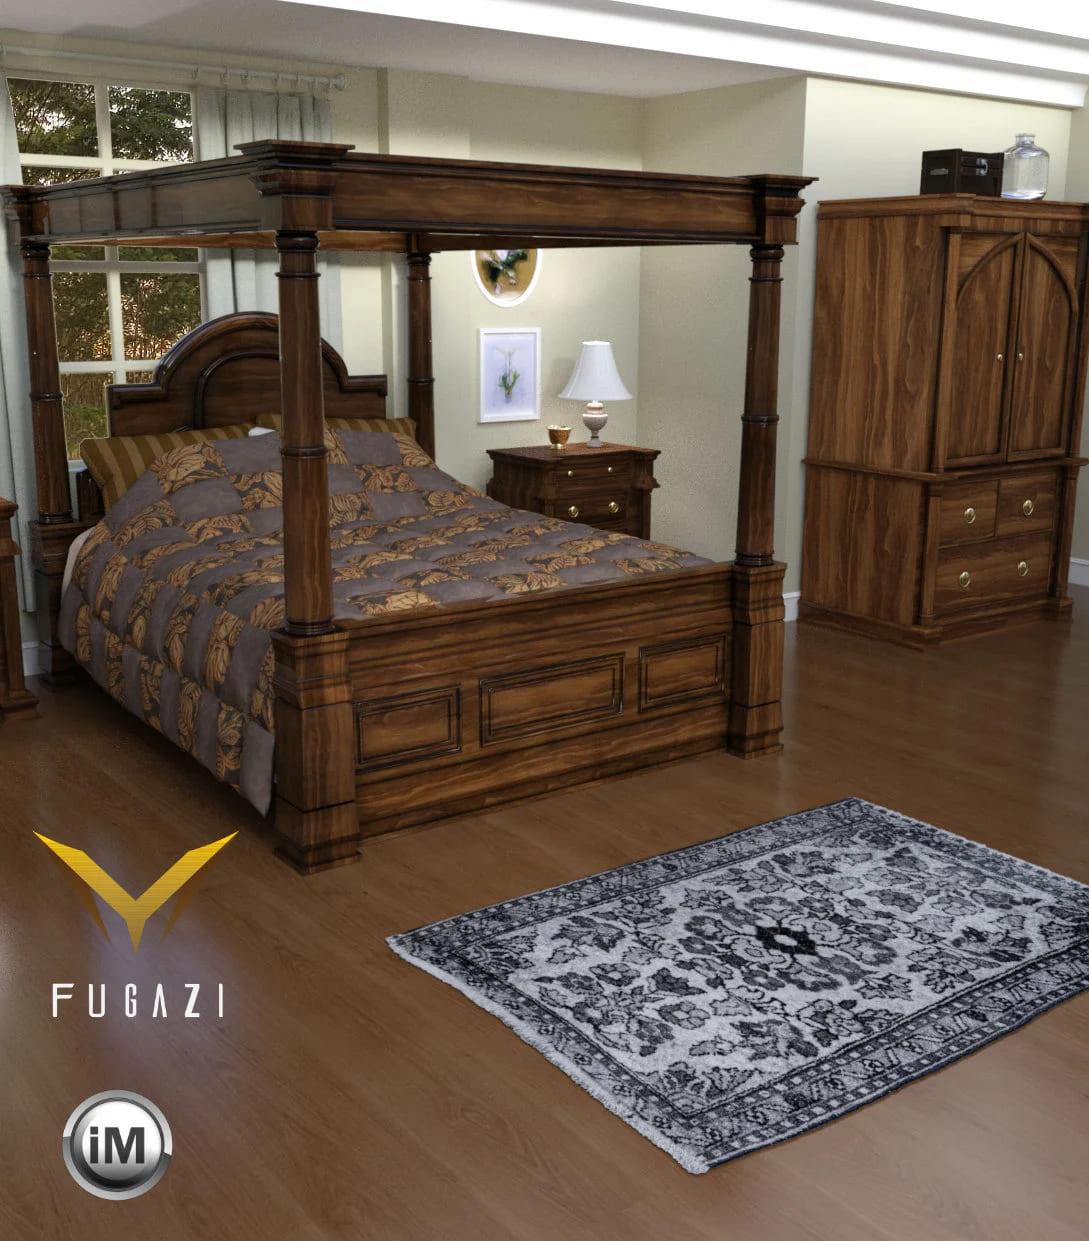 FG Romantic Bedroom Bundle_DAZ3D下载站